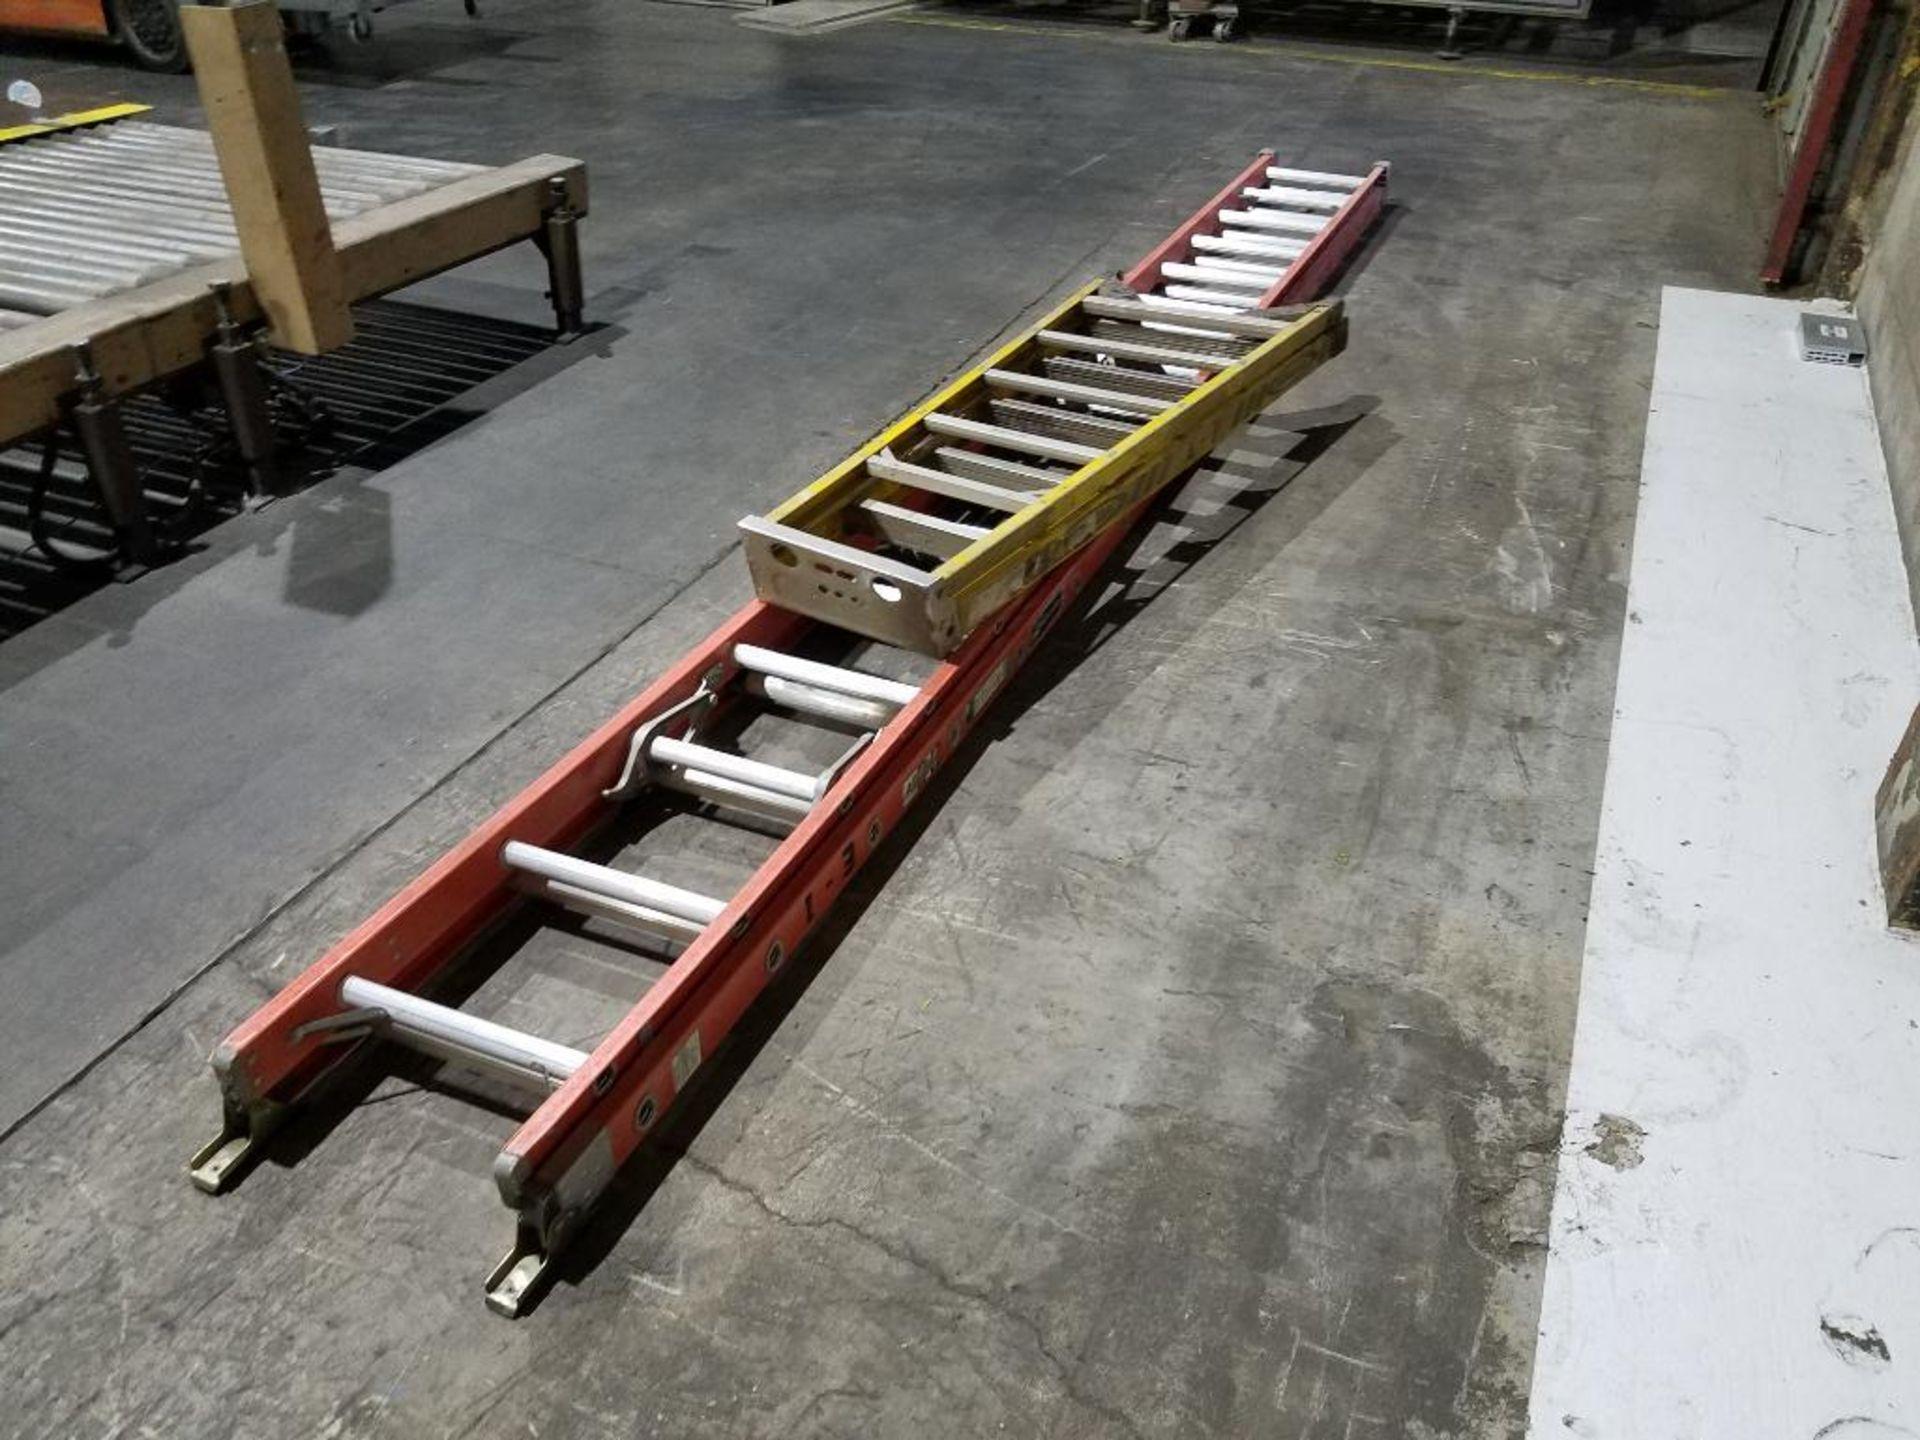 Werner 6 ft. step ladder and Louisville 32 ft. extension ladder - Image 3 of 3